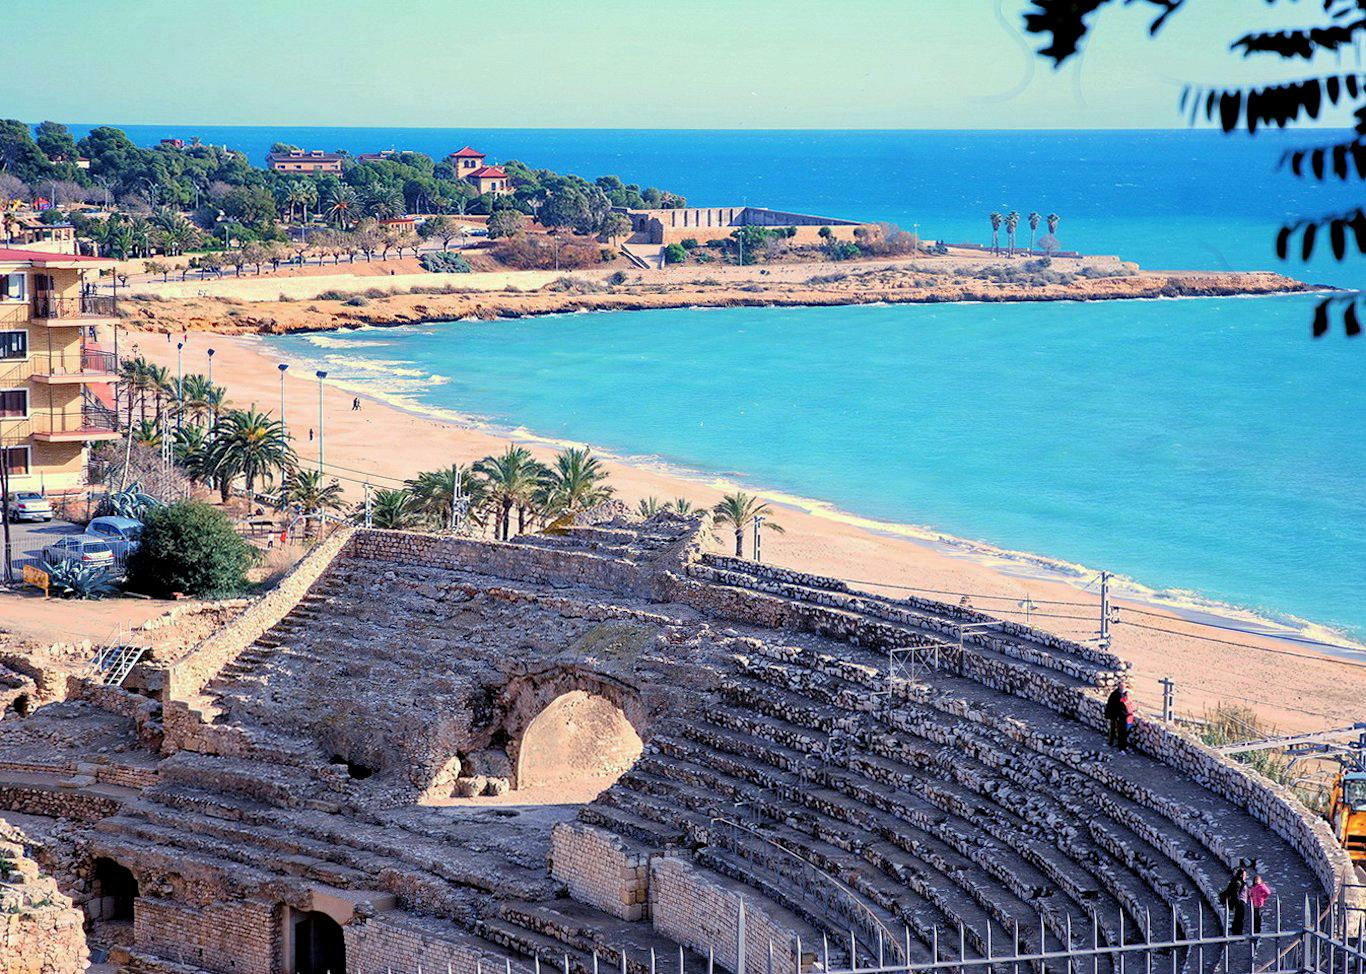 Noleggio Barche Tarragona - Navalia | Noleggia un Sogno